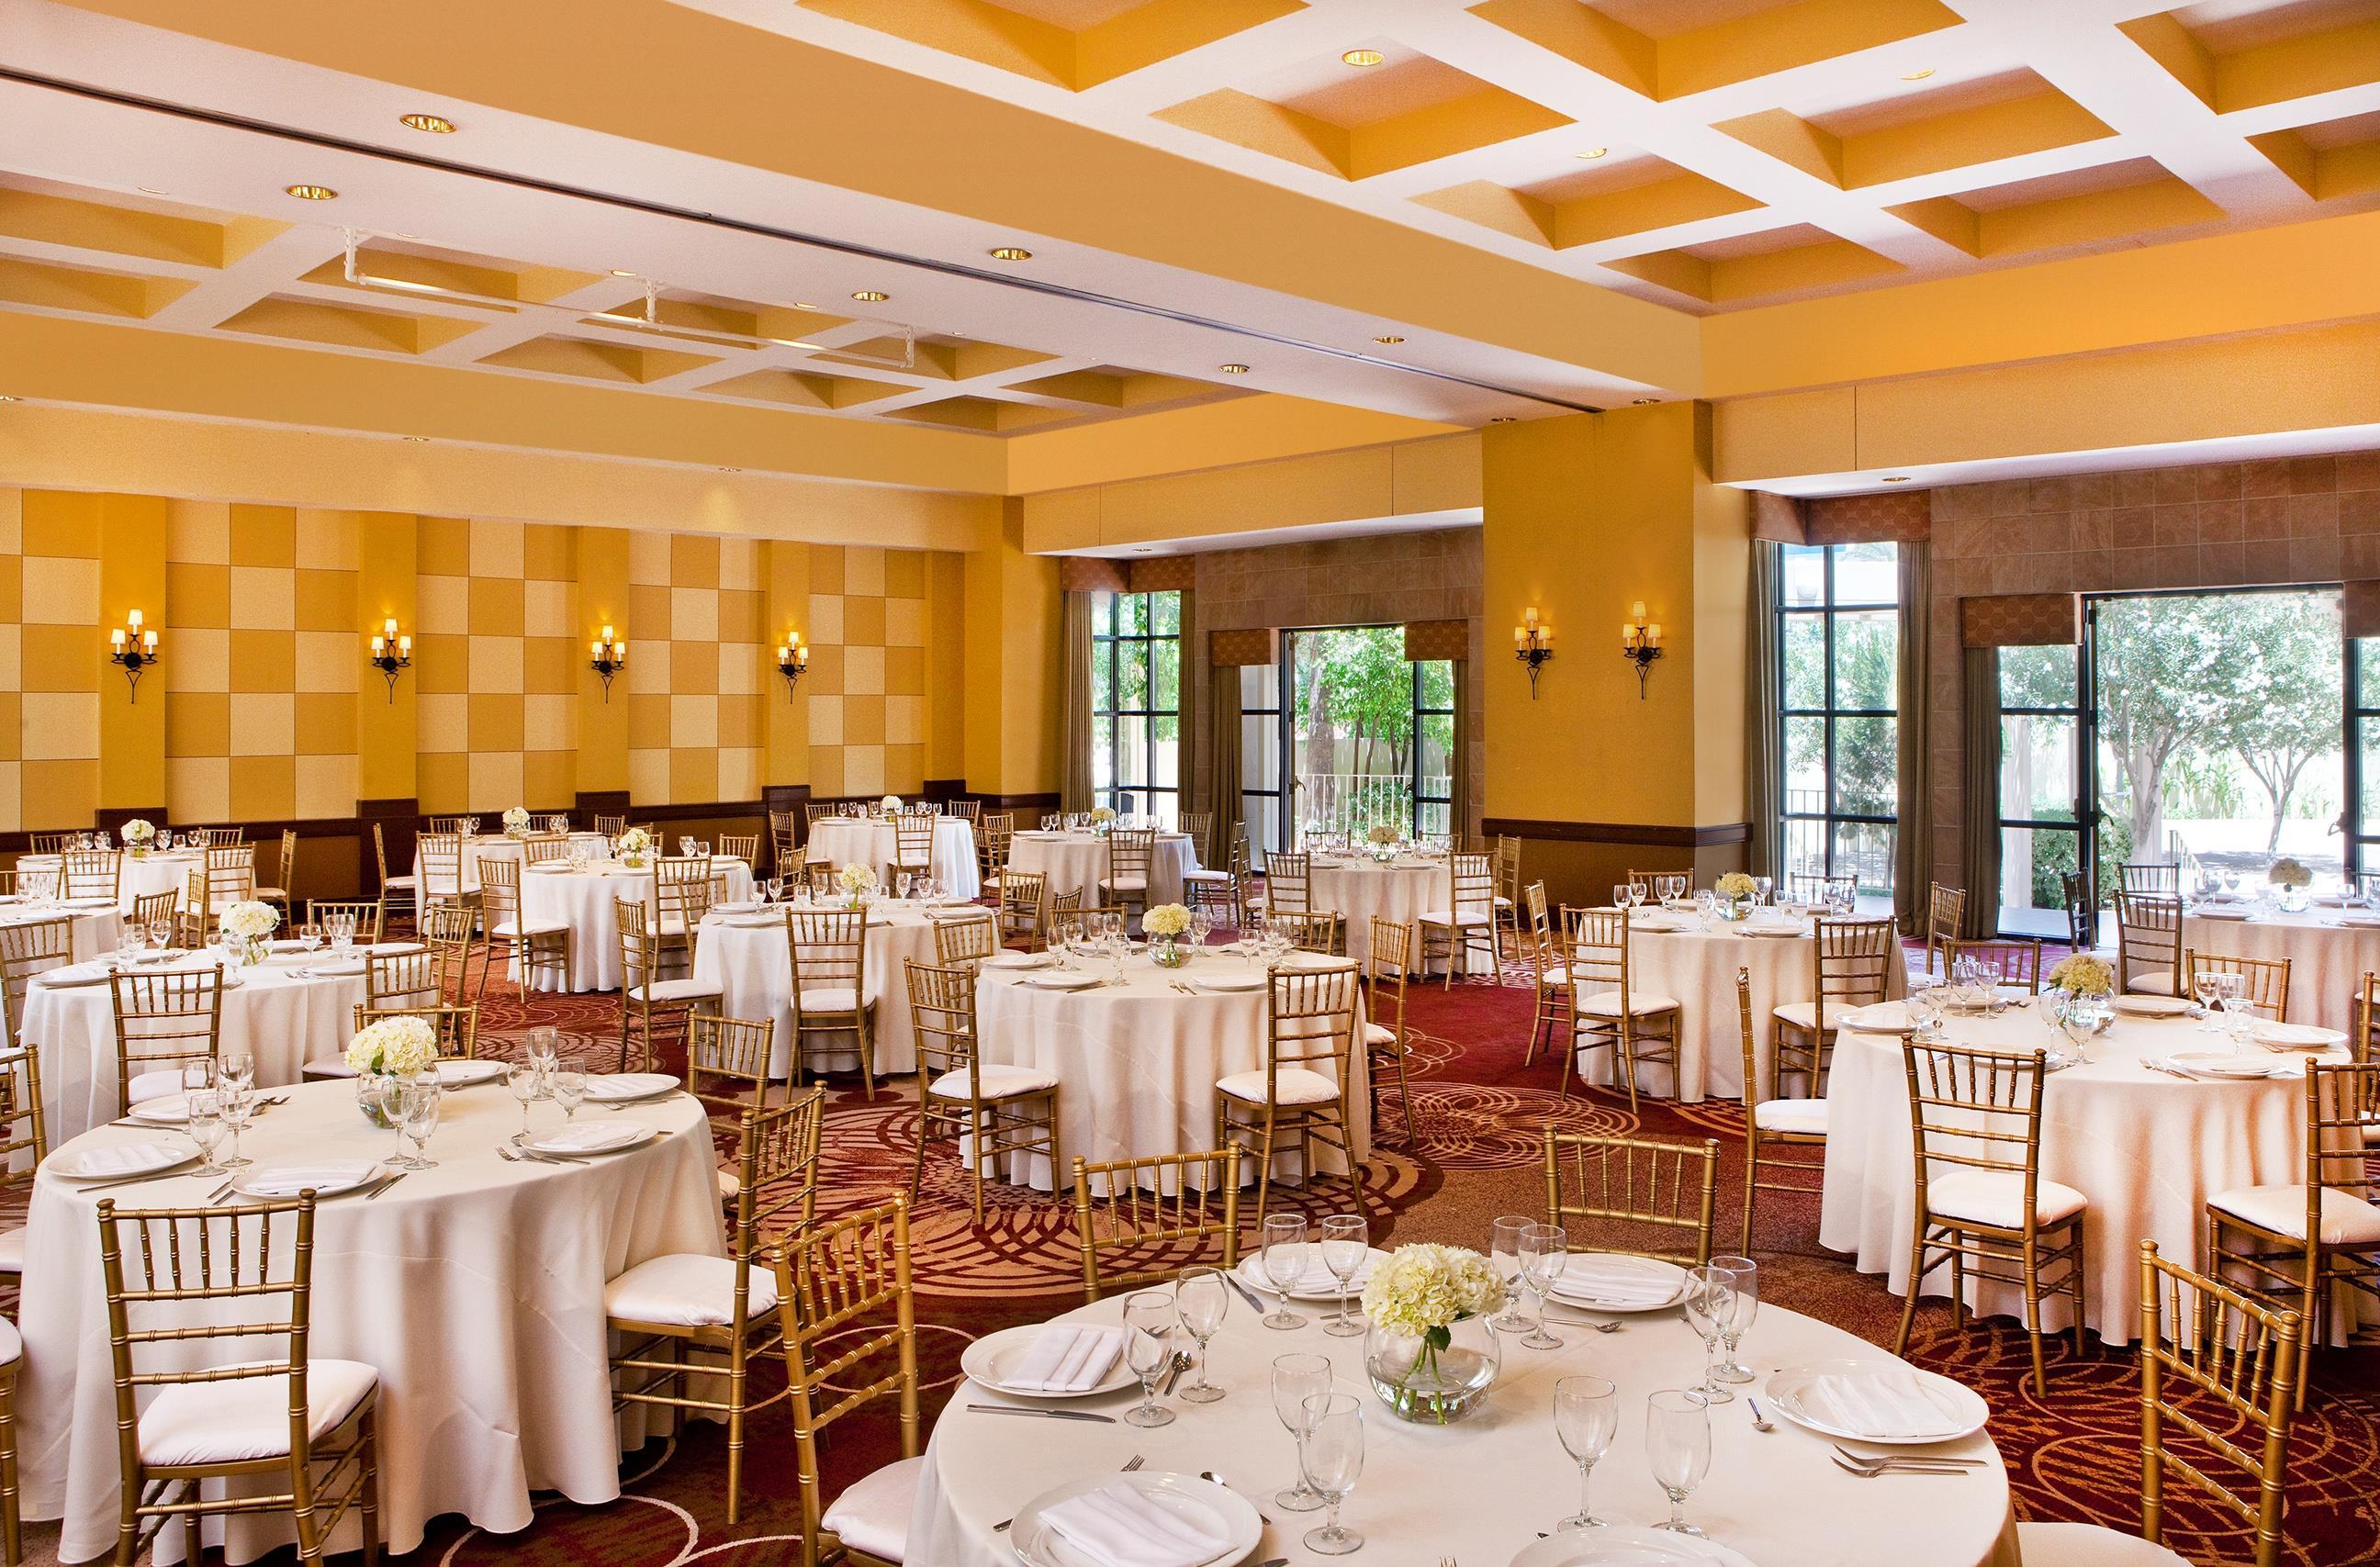 Sheraton Crescent Hotel image 22